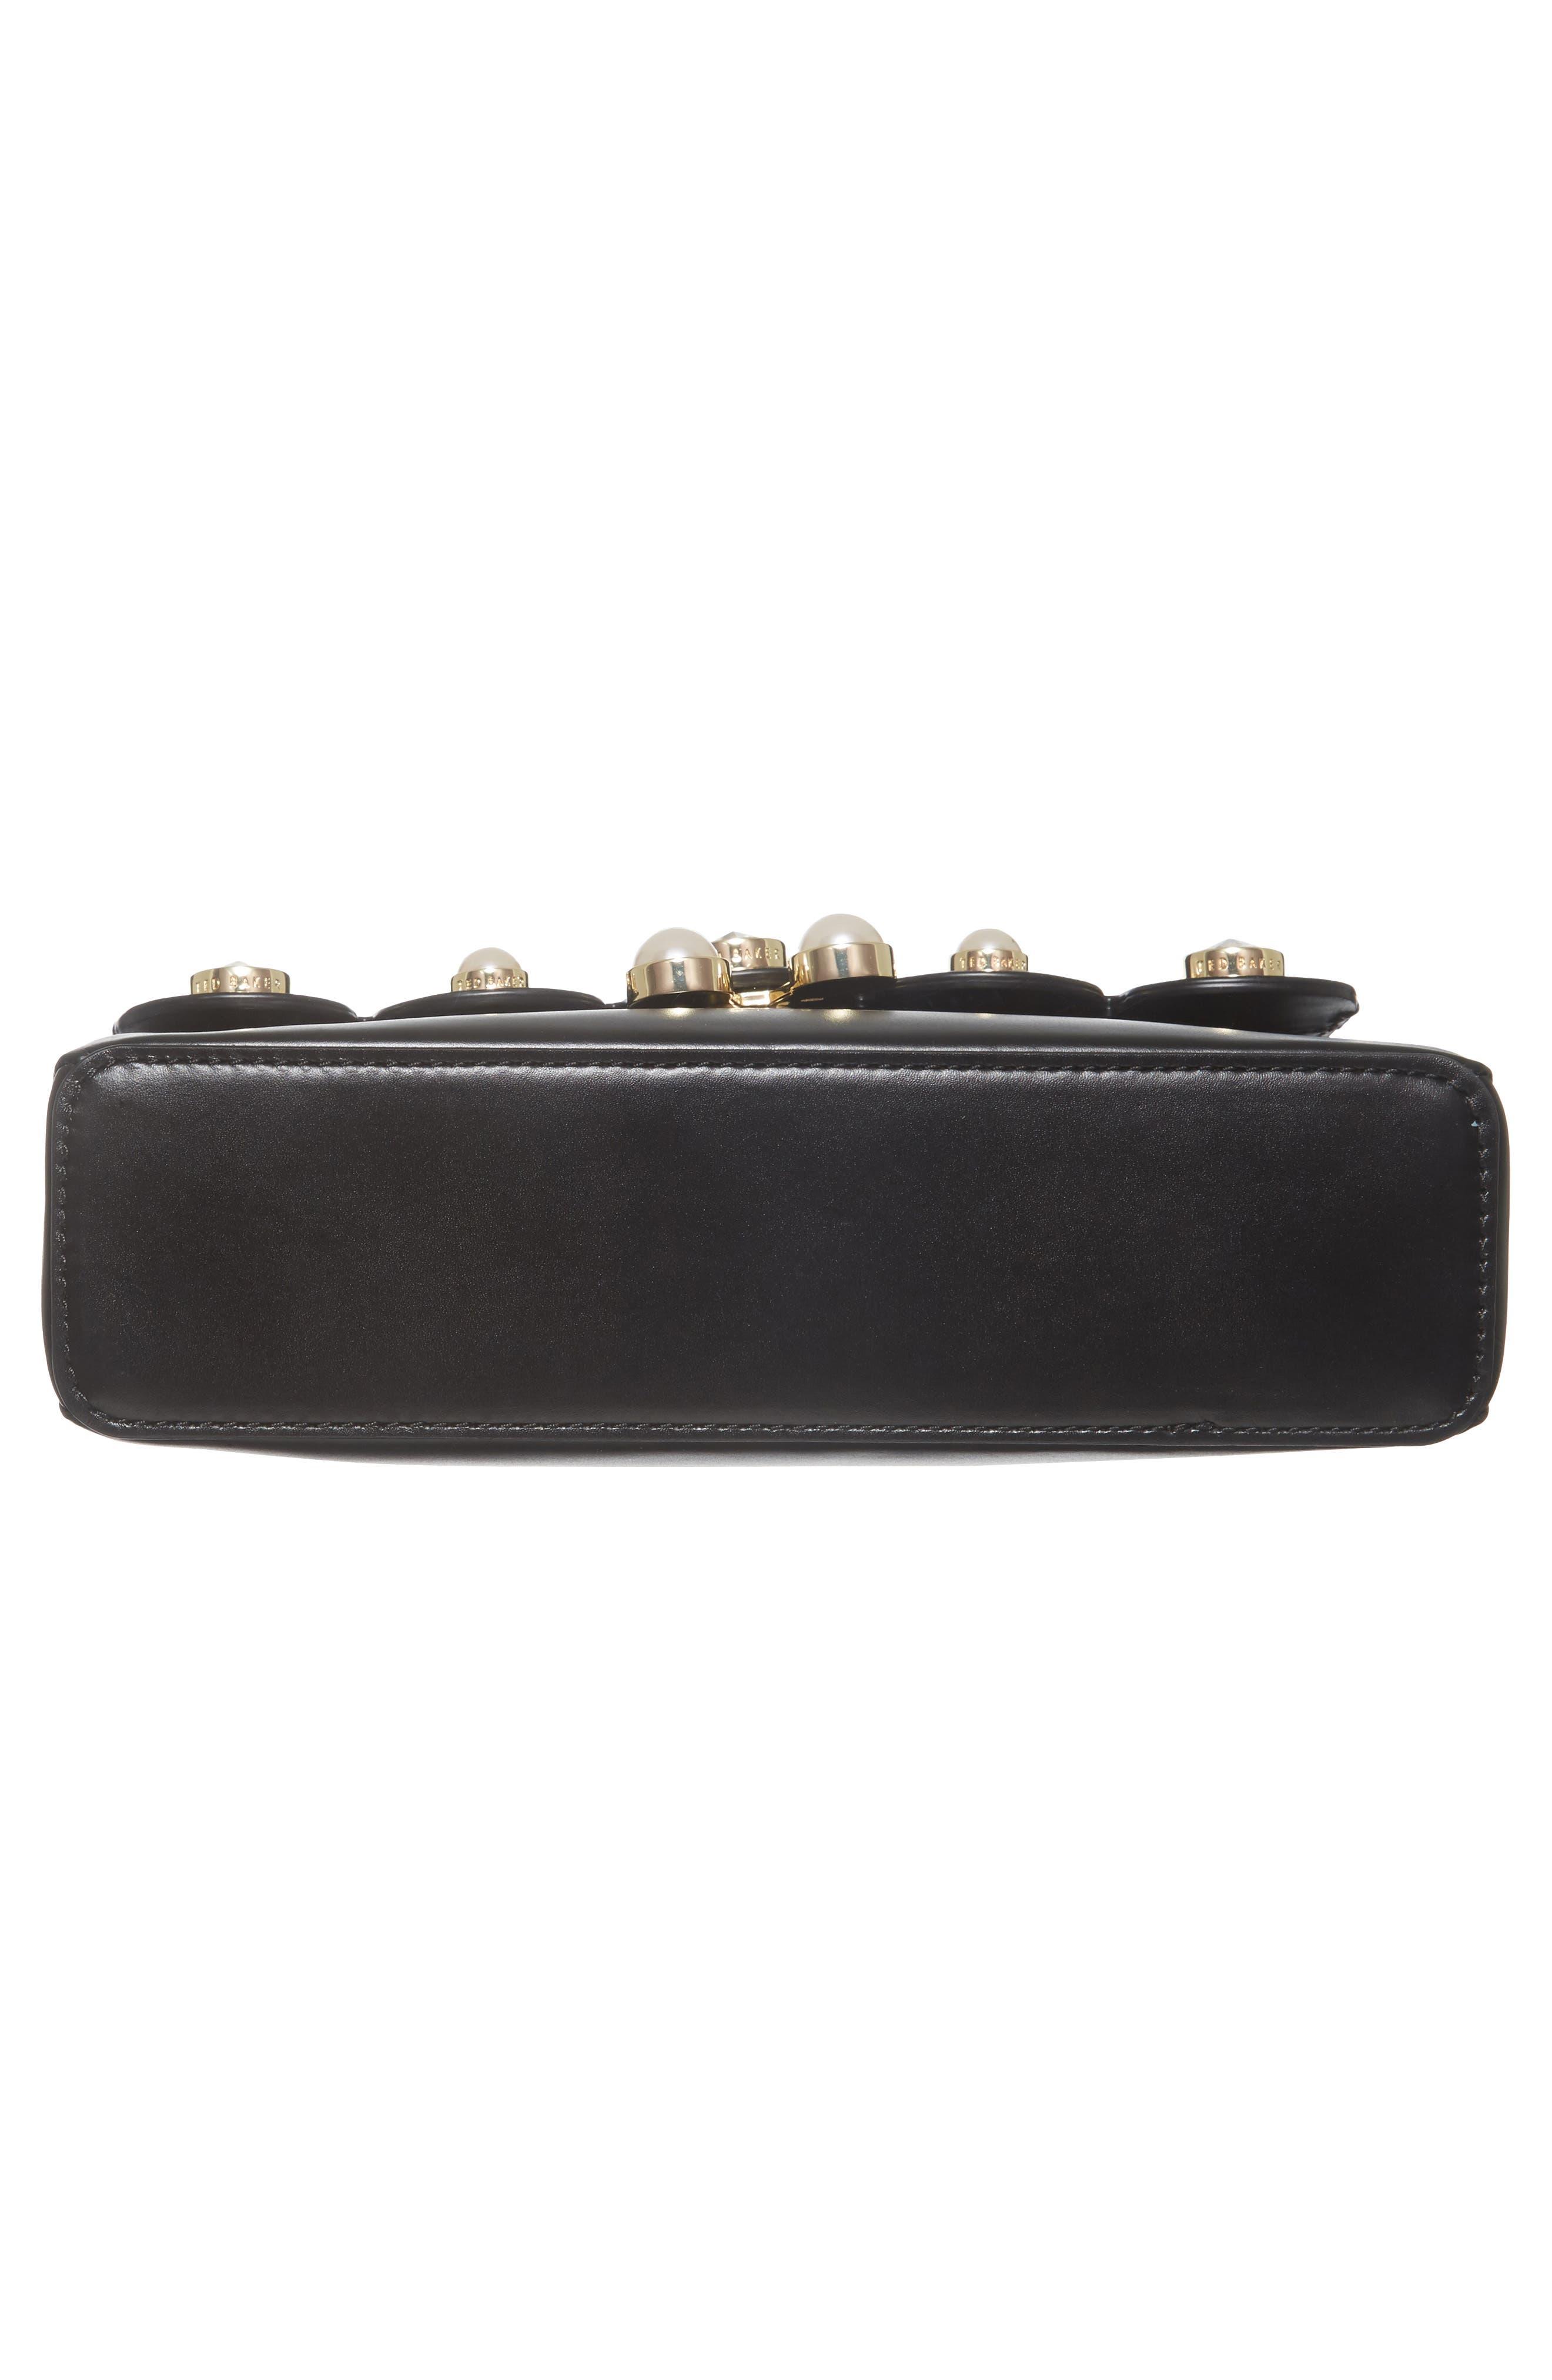 Saraa Leather Crossbody Bag,                             Alternate thumbnail 6, color,                             001